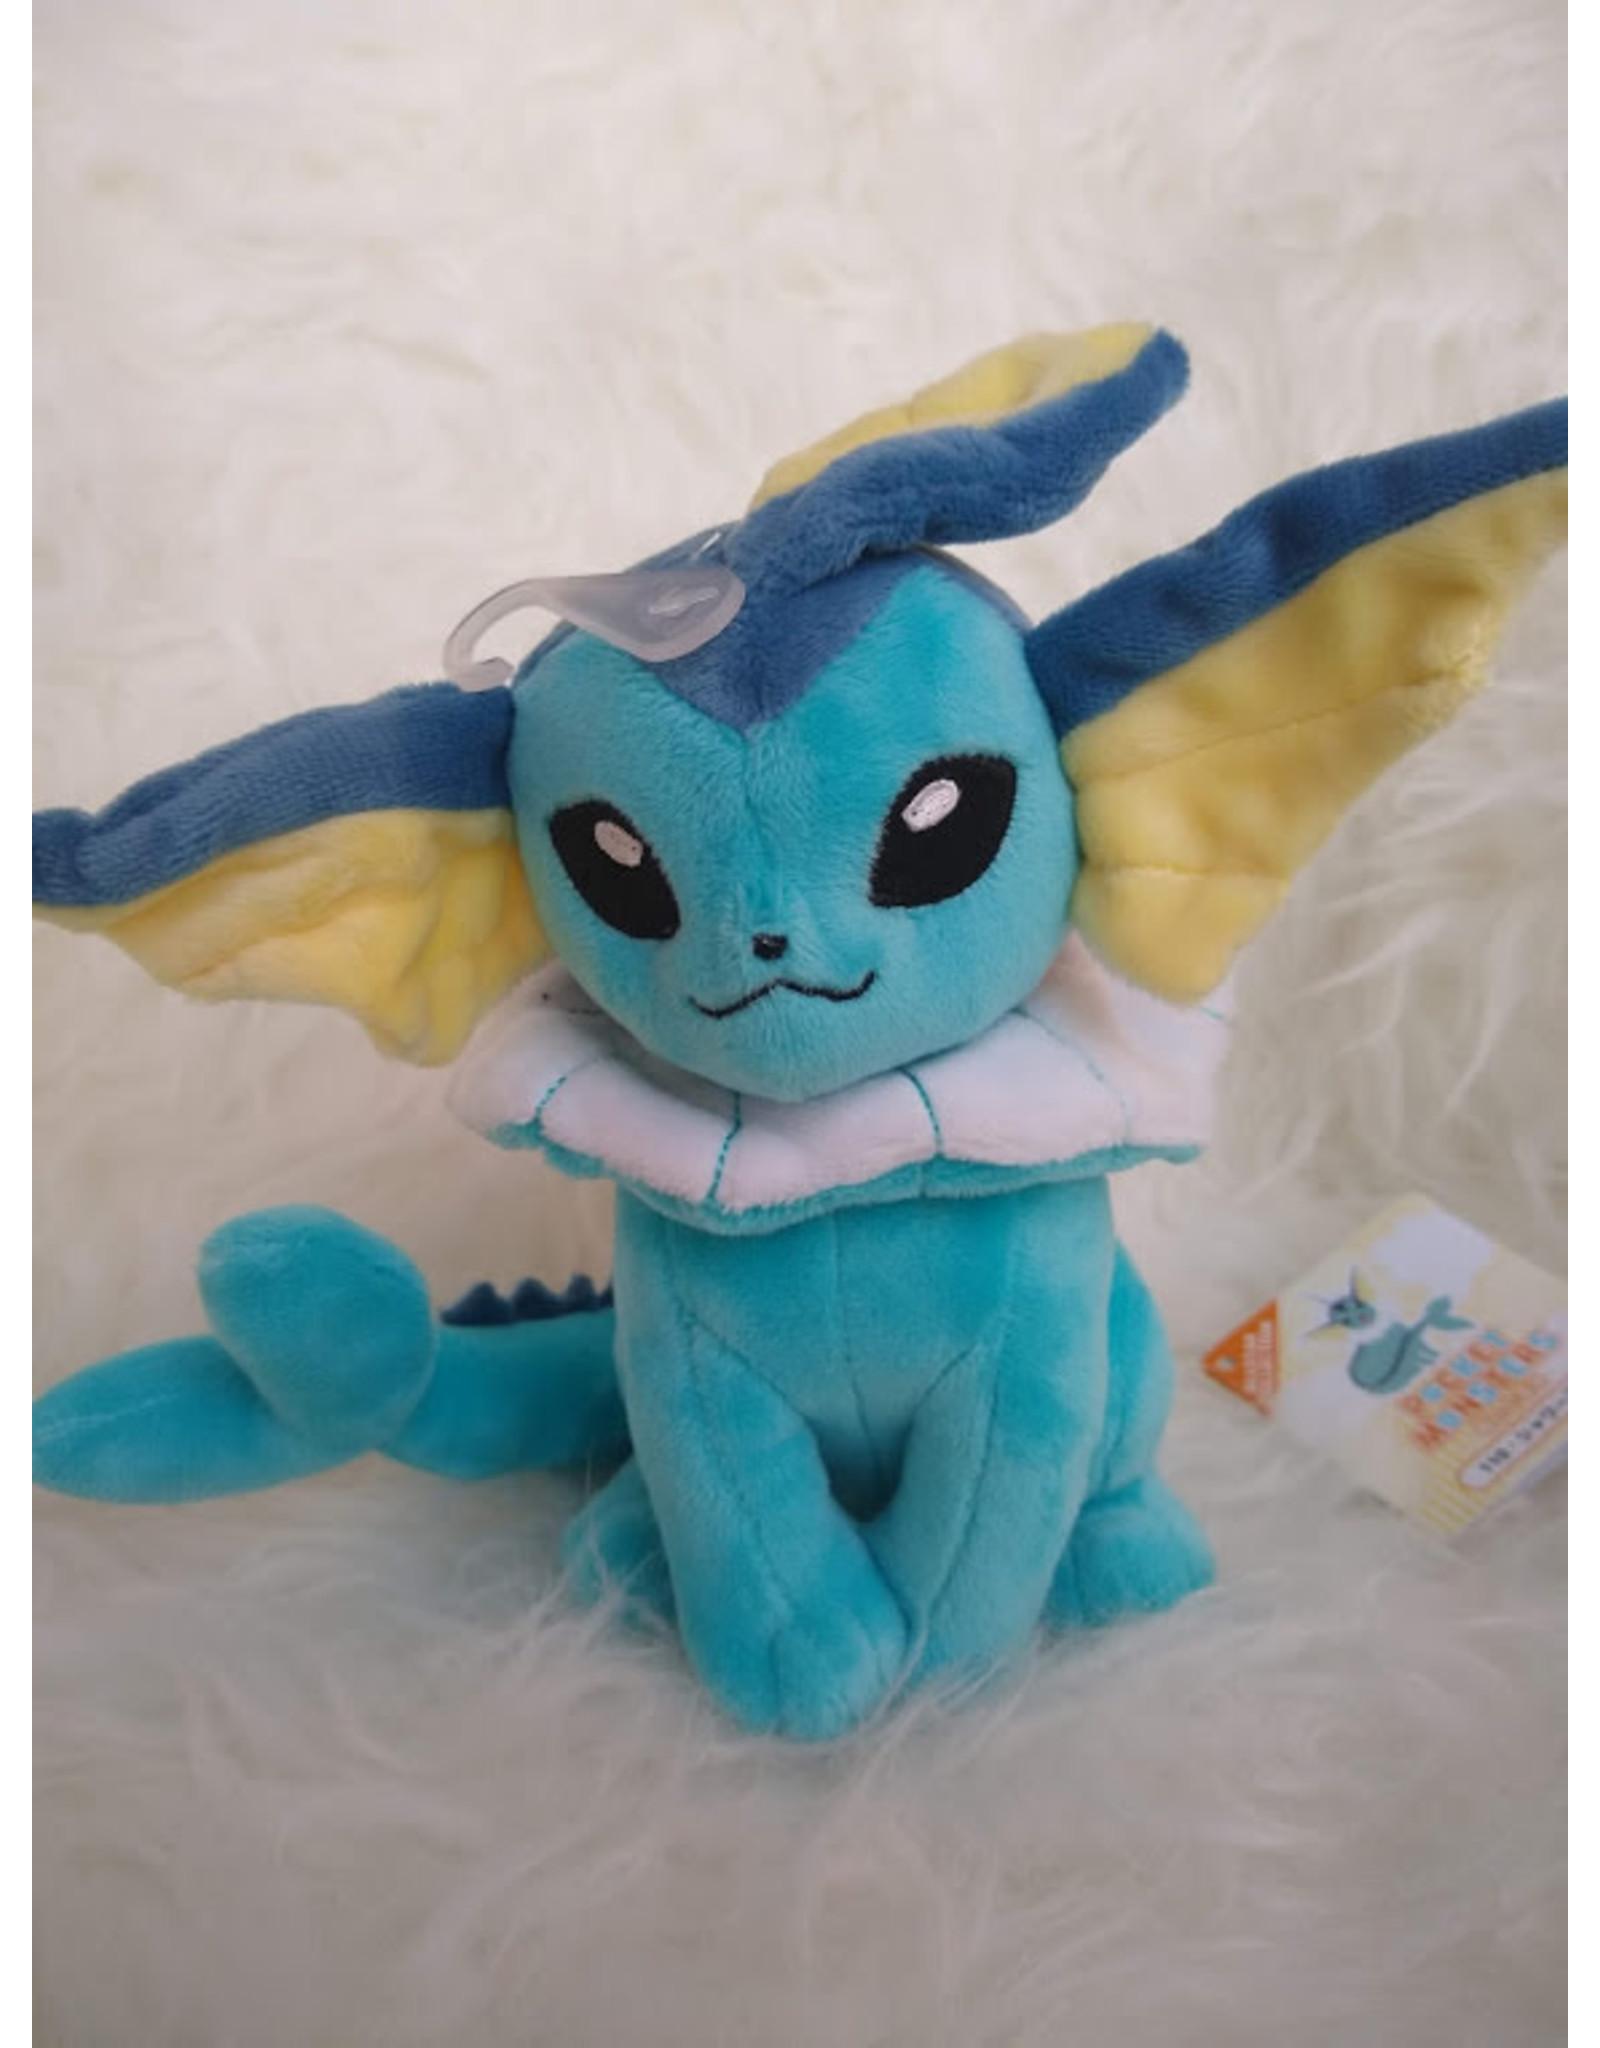 Vaporeon - Pokemon Plushie - 20cm (Japanese import)